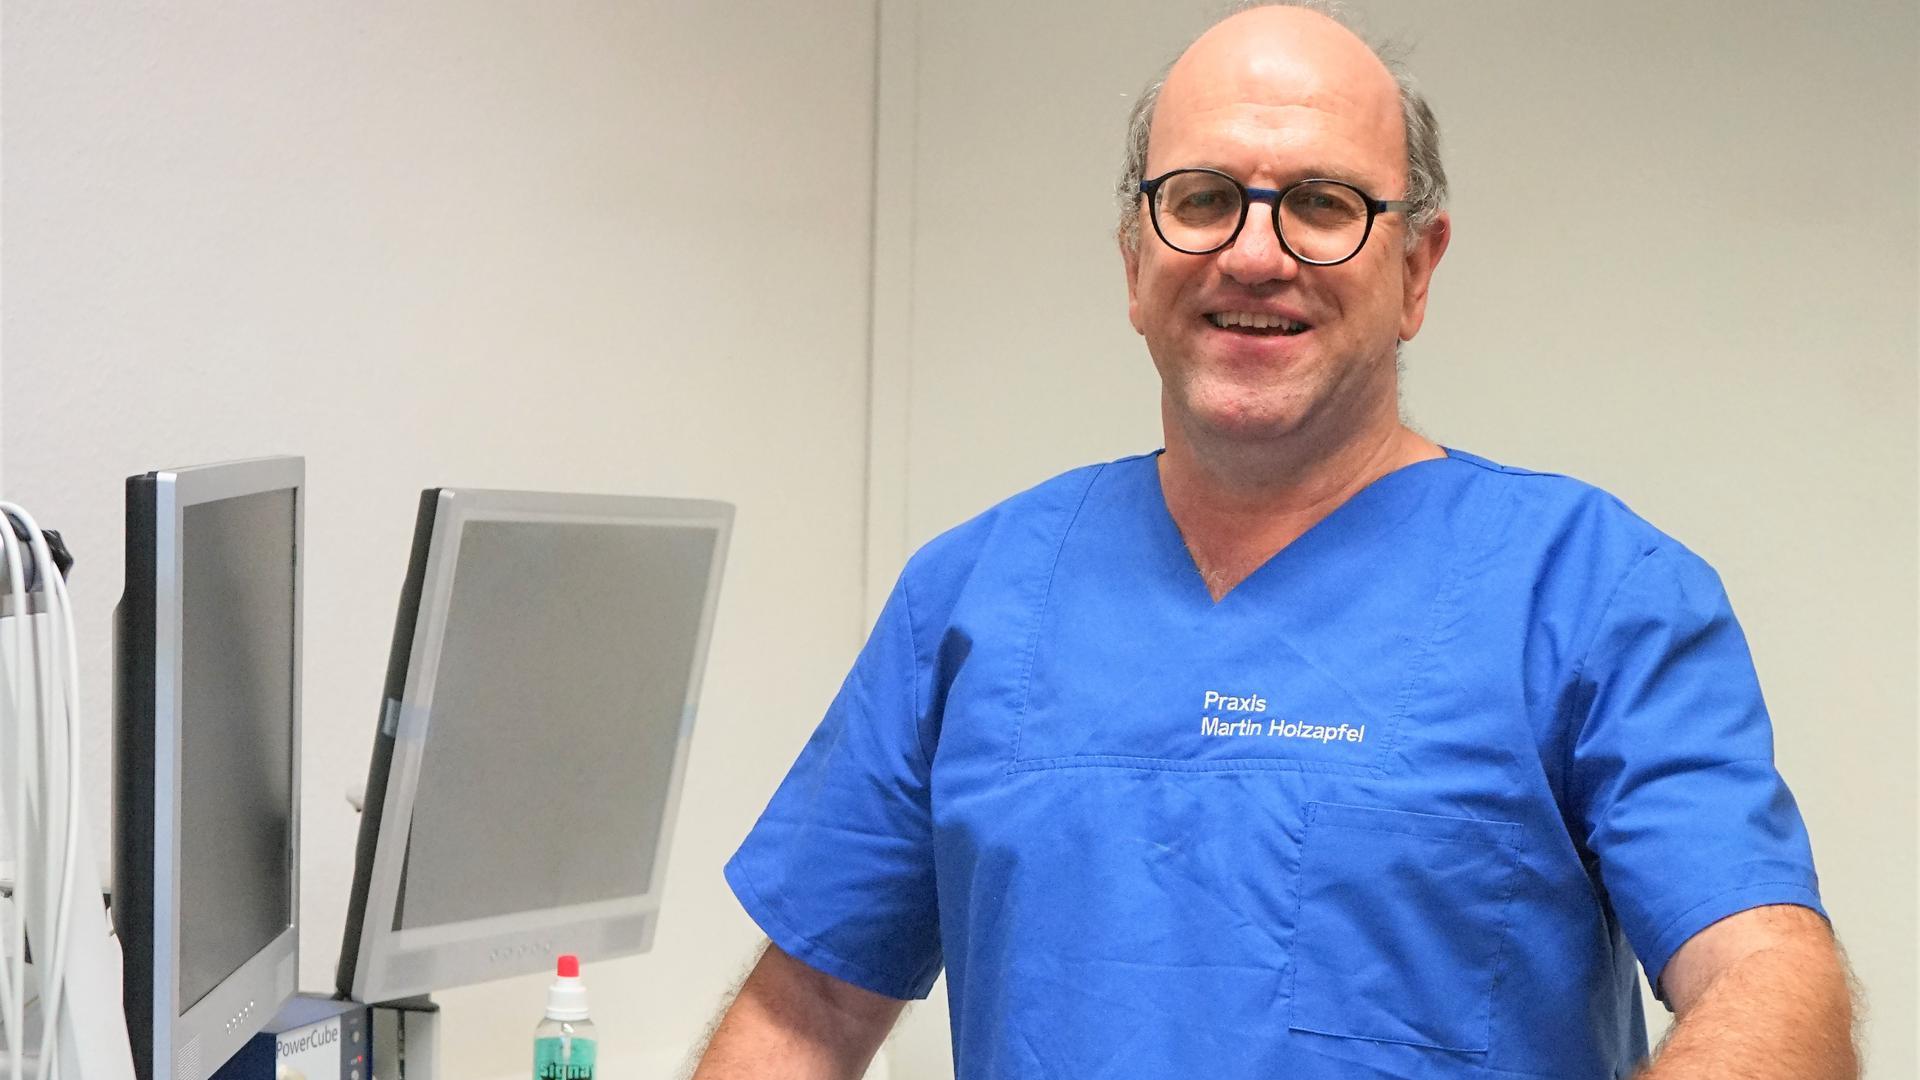 Hausarzt Martin Holzapfel aus Rastatt-Ottersdorf